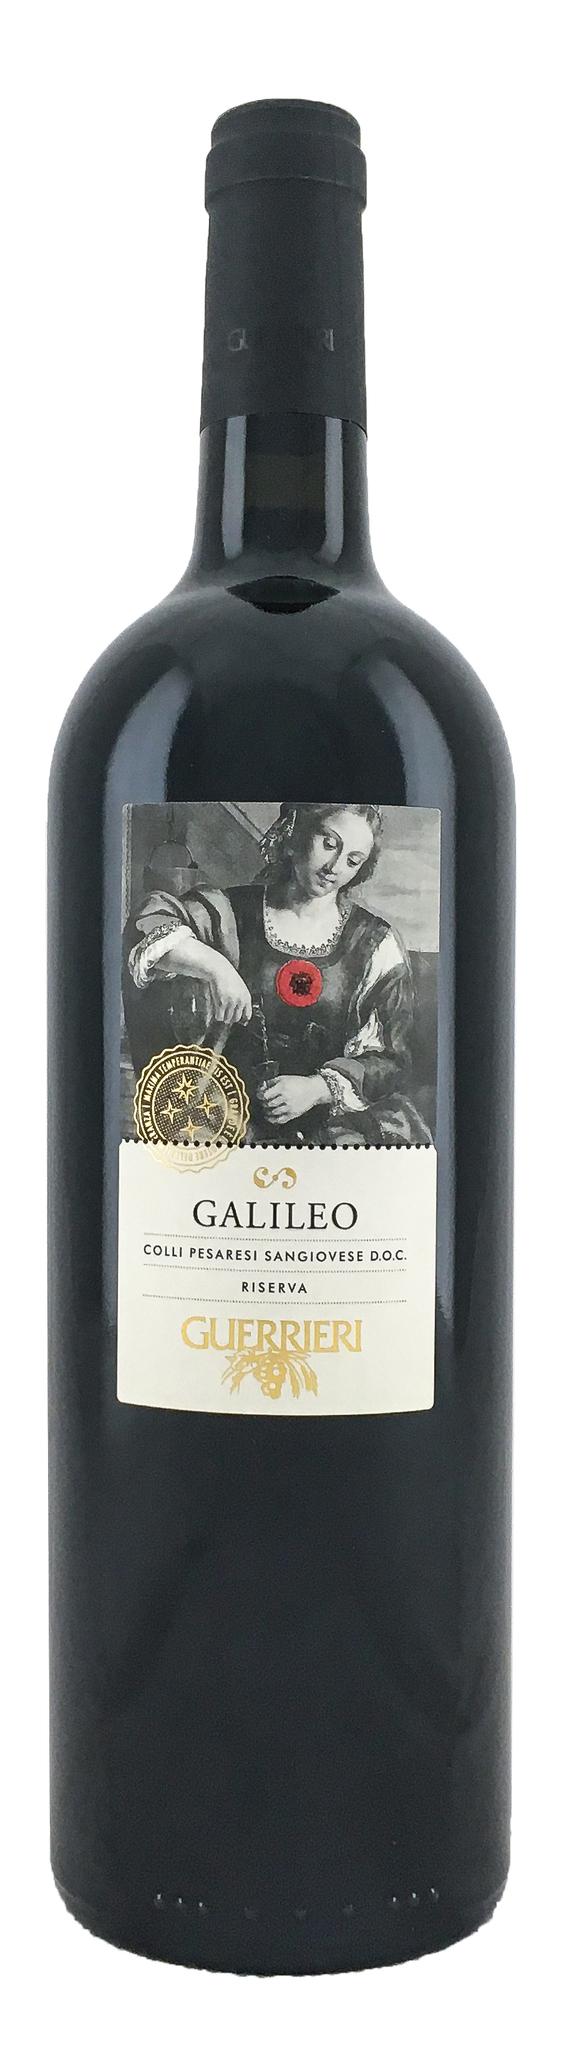 Вино Галилео сухое красное з.н.м.п. кат. DOC, рег. Марке 0,75л.